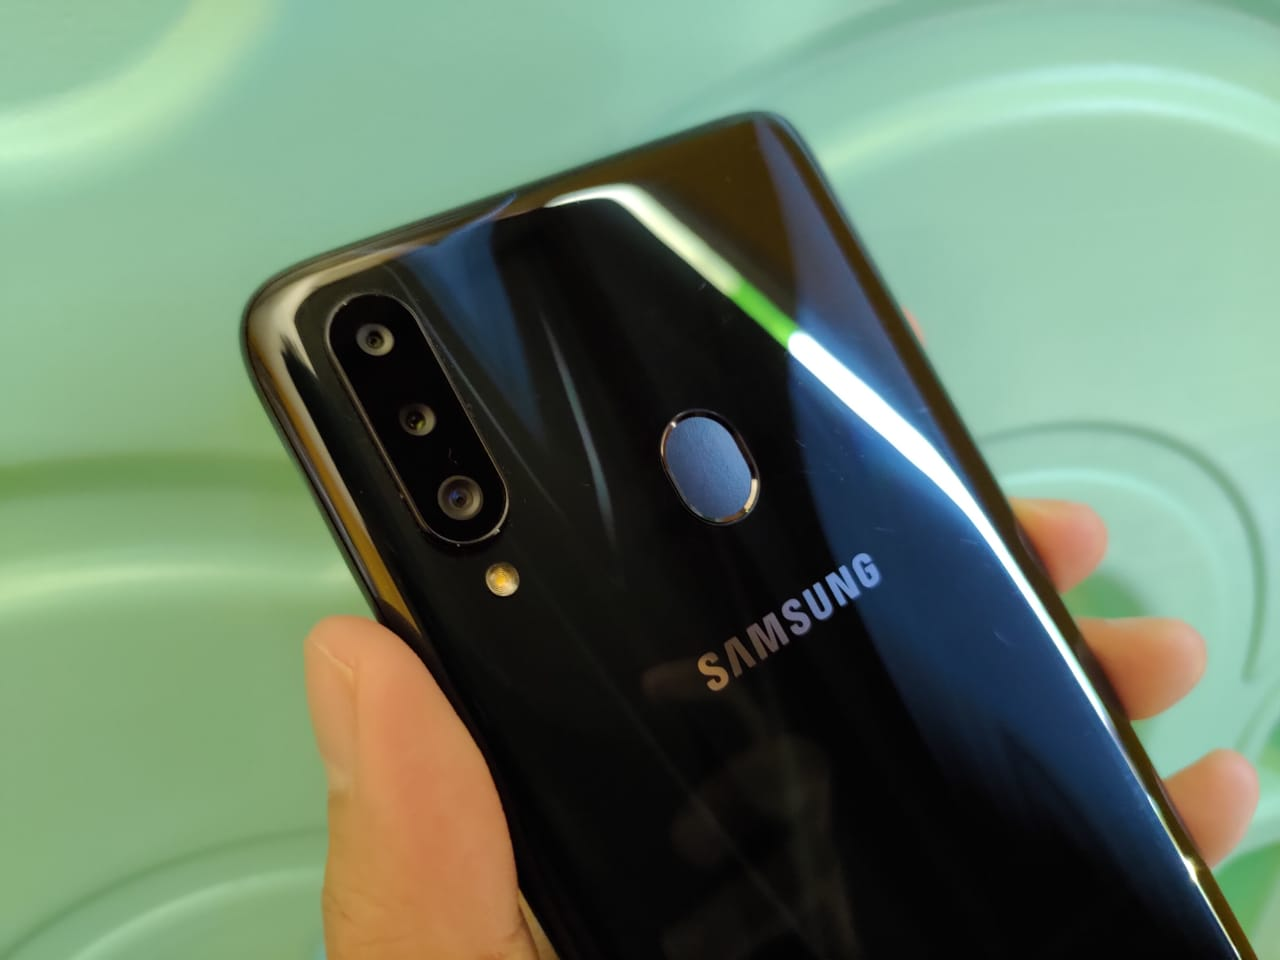 Samsung Galaxy A20s, Terjangkau Tetap Jamin Kualitas